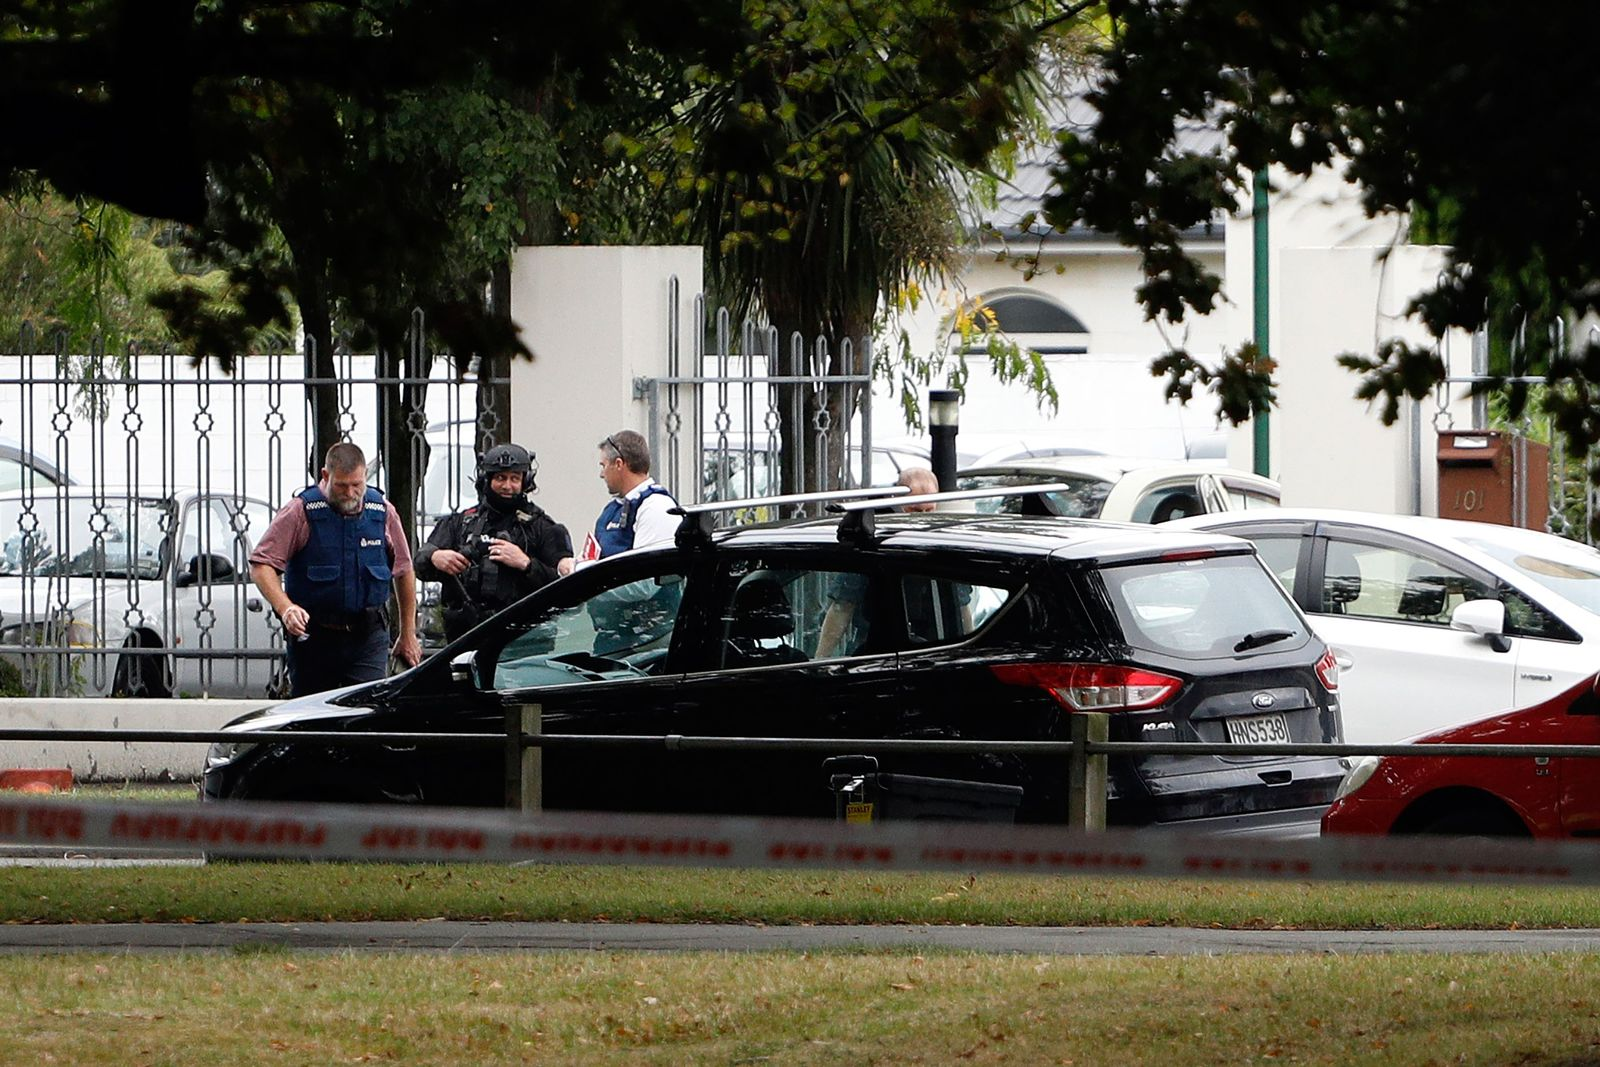 Neuseeland/ NZEALAND-CRIME-SHOOTING